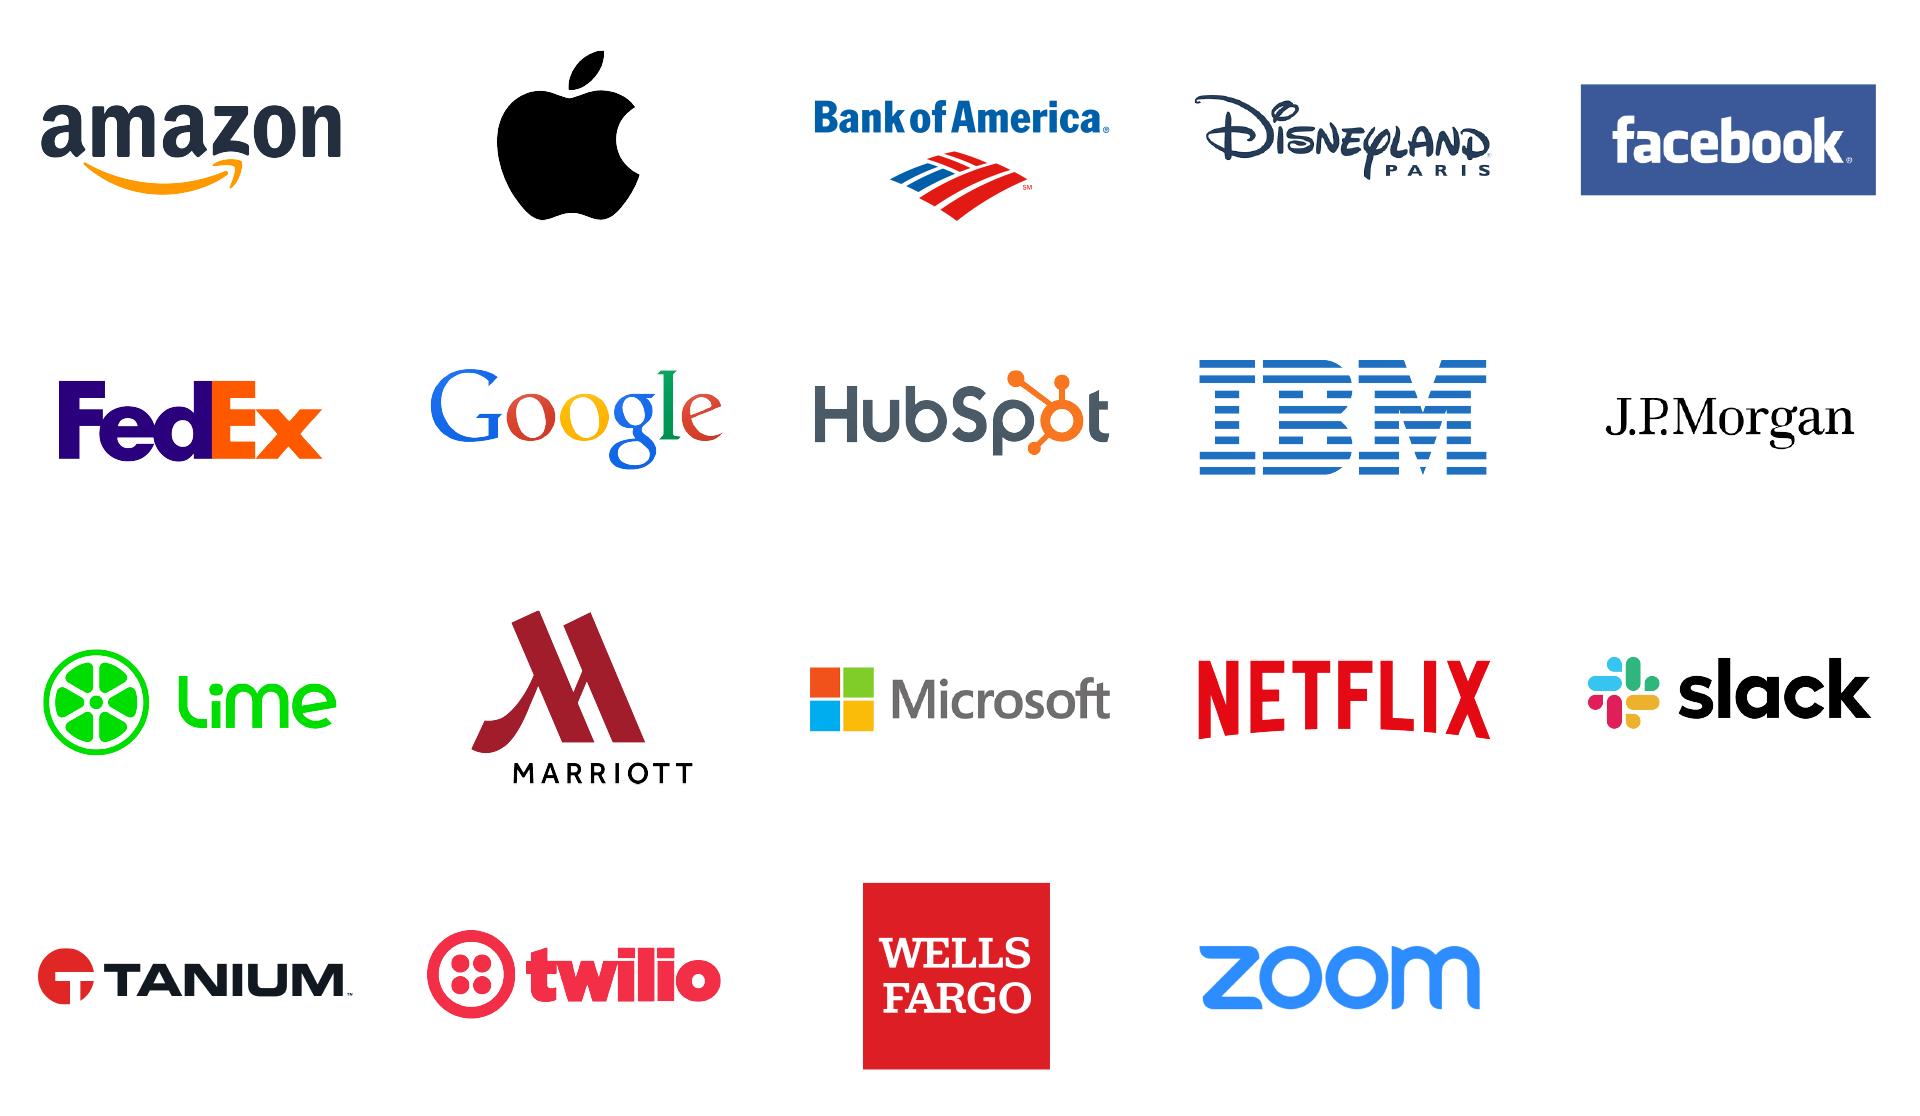 American Companies In Paris